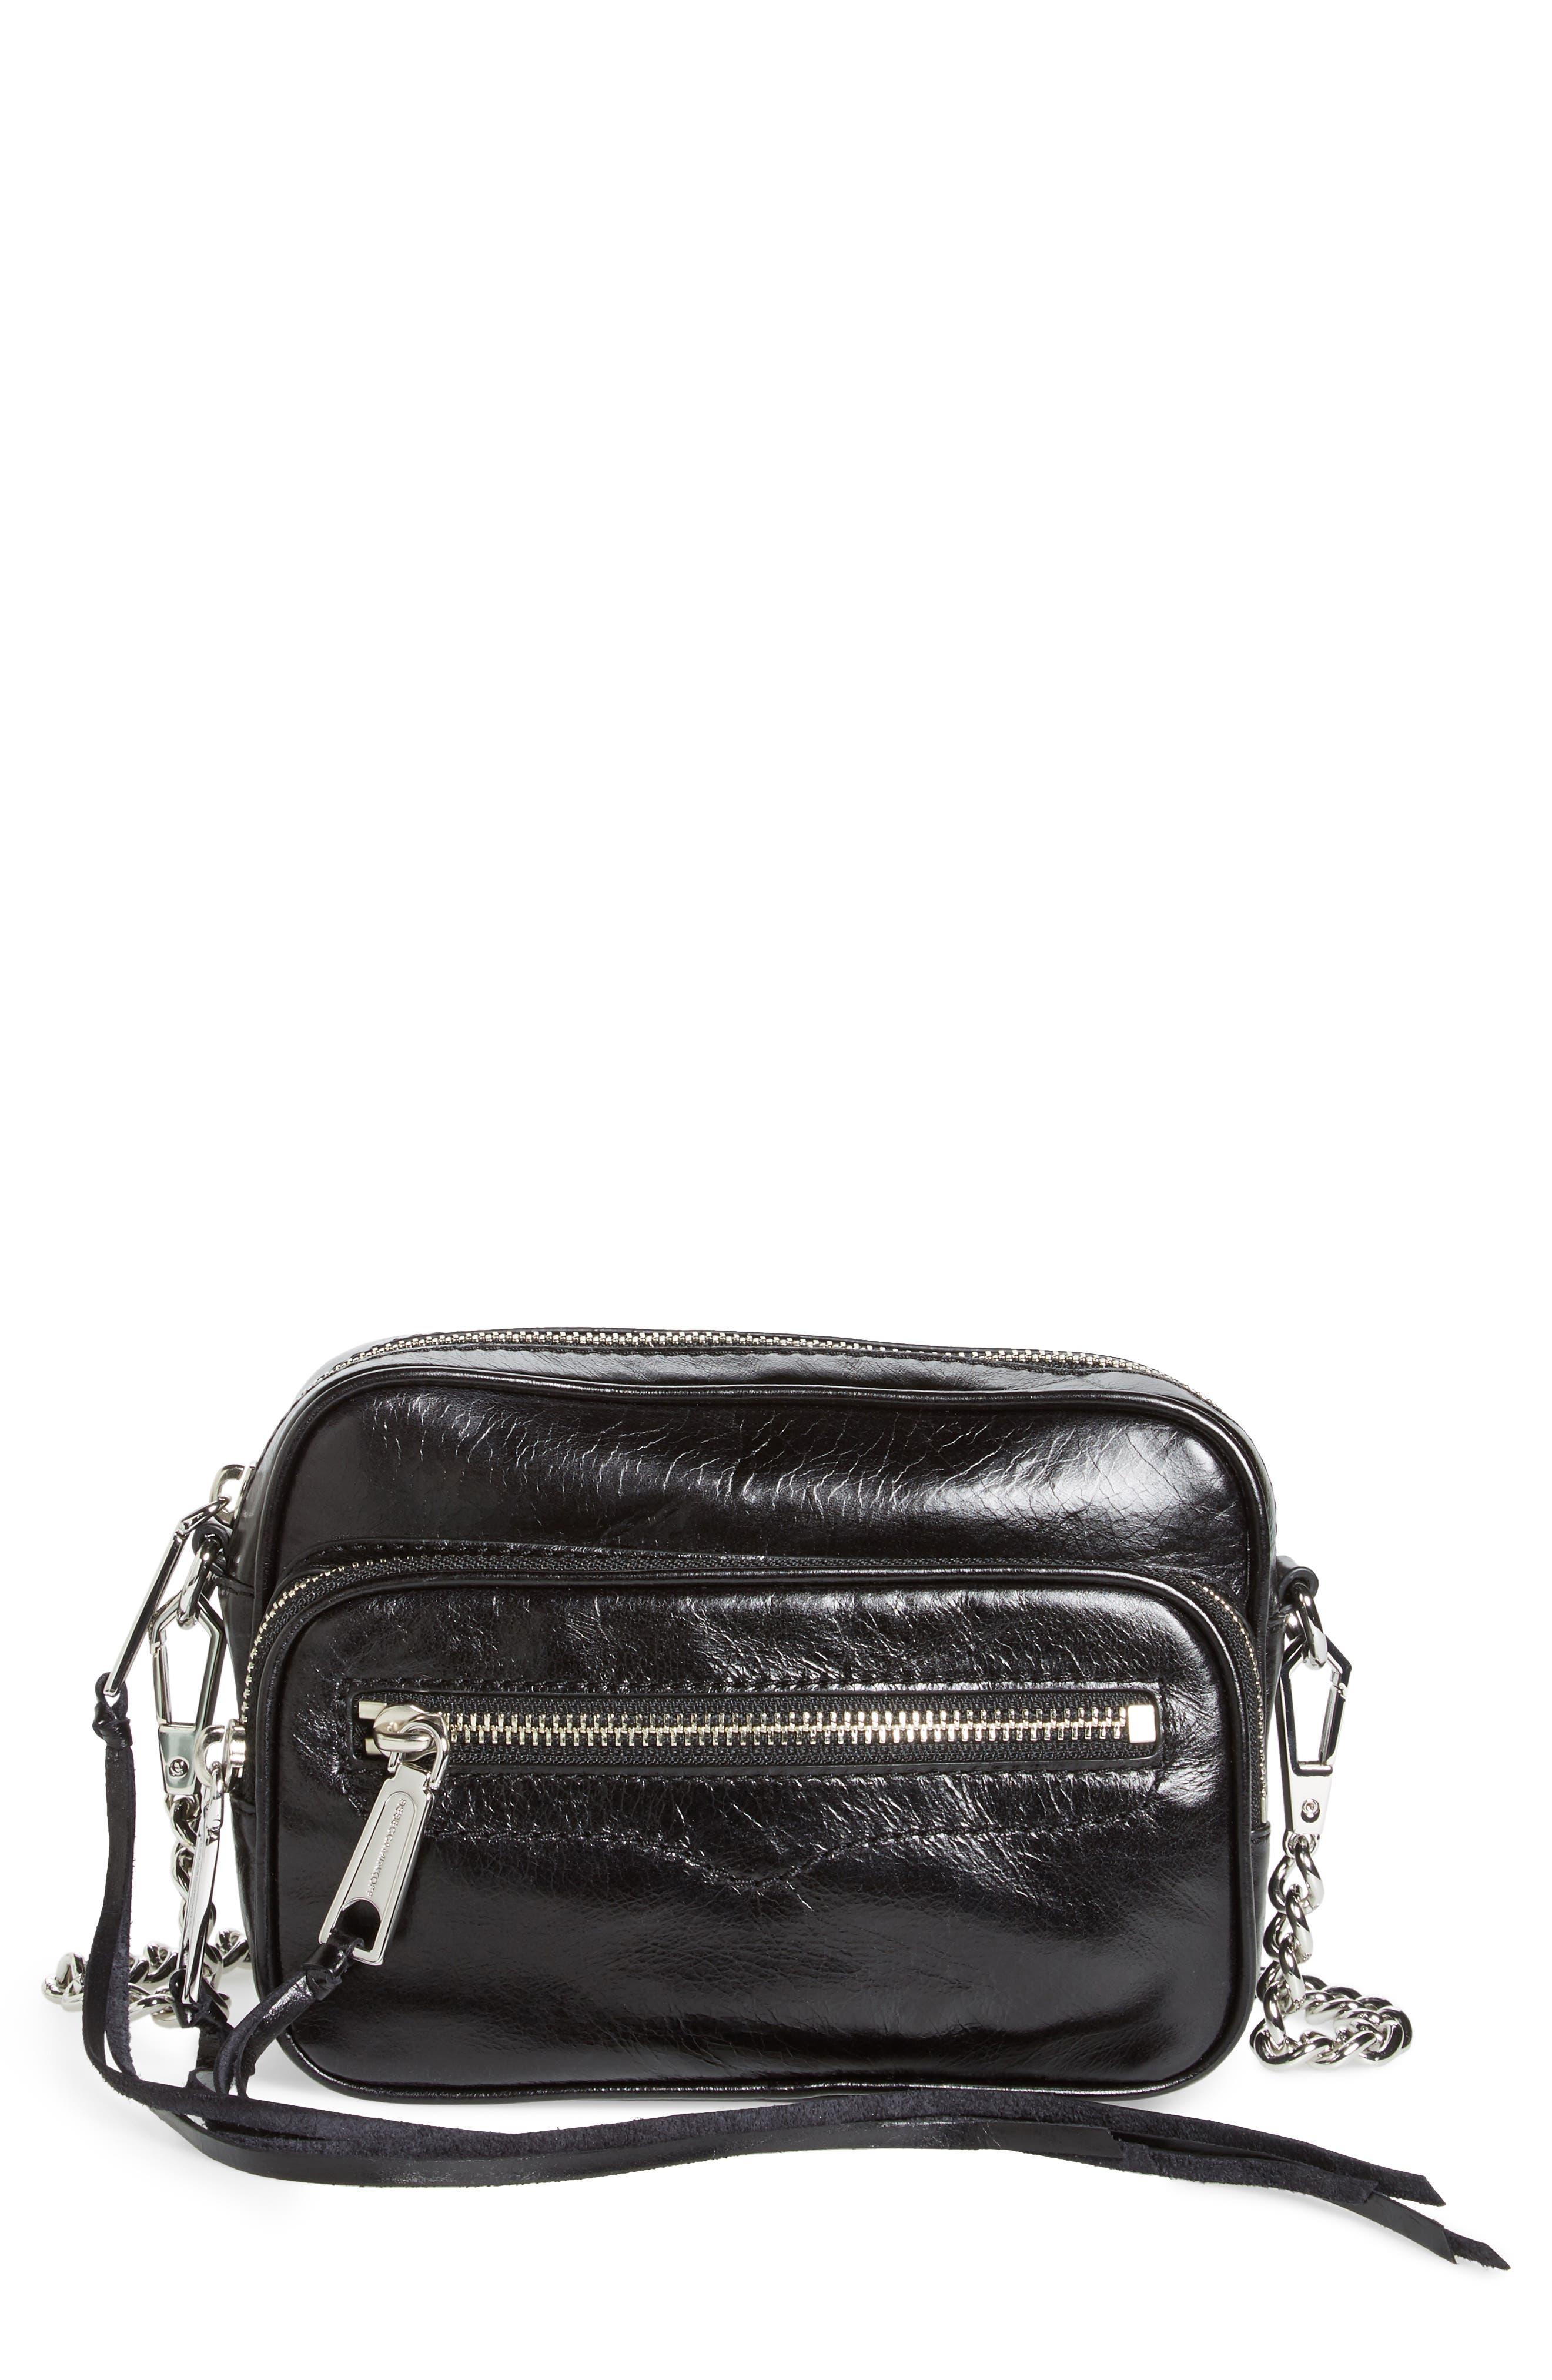 Rebecca Minoff Solstice Leather Camera Bag